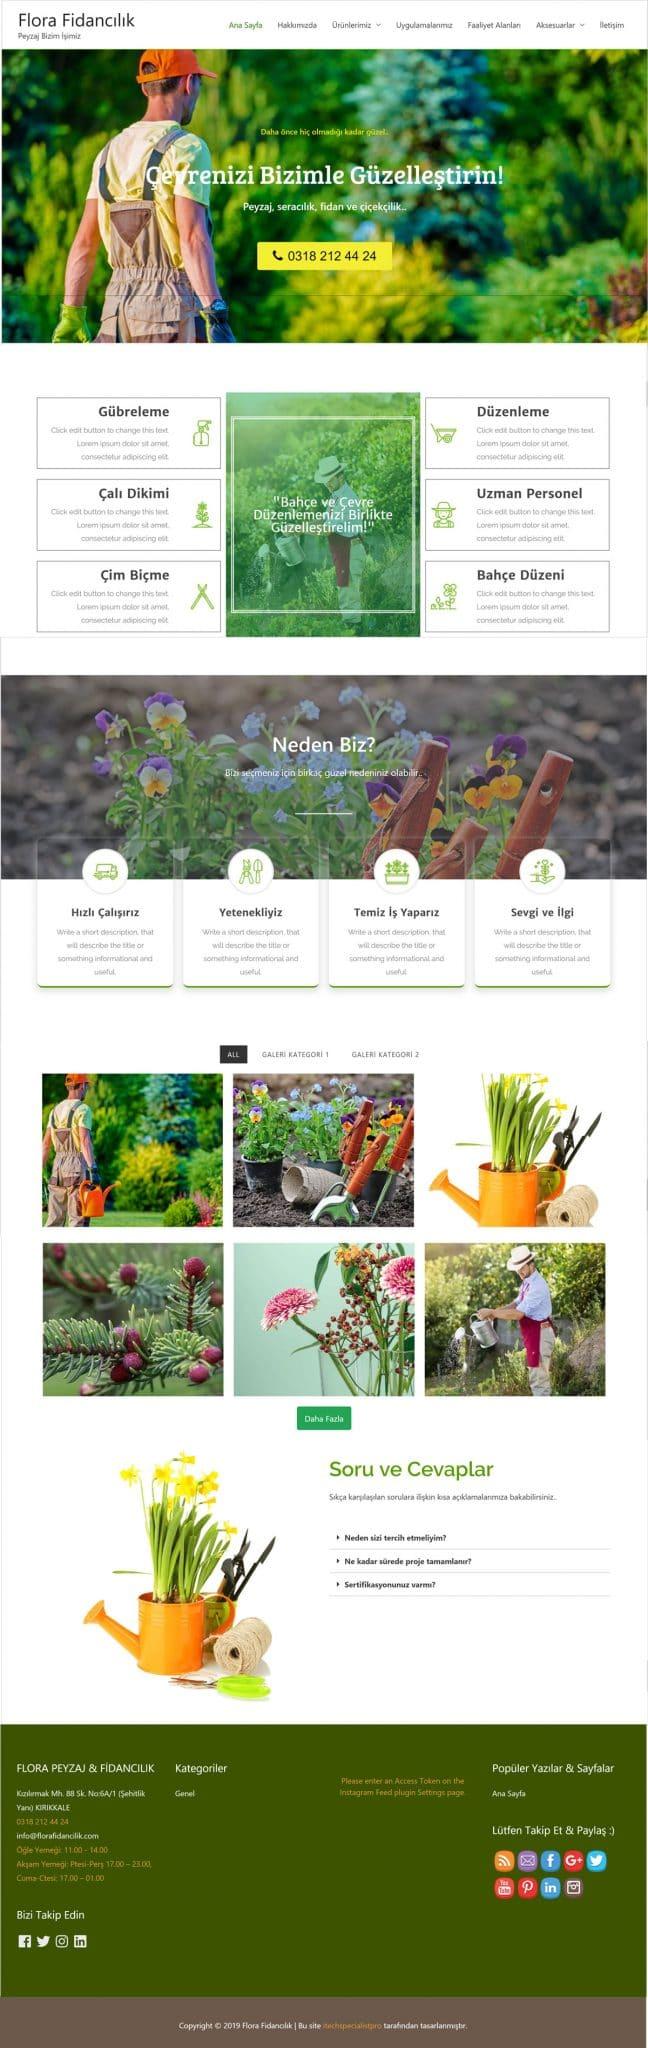 peyzaj-web-tasarimi